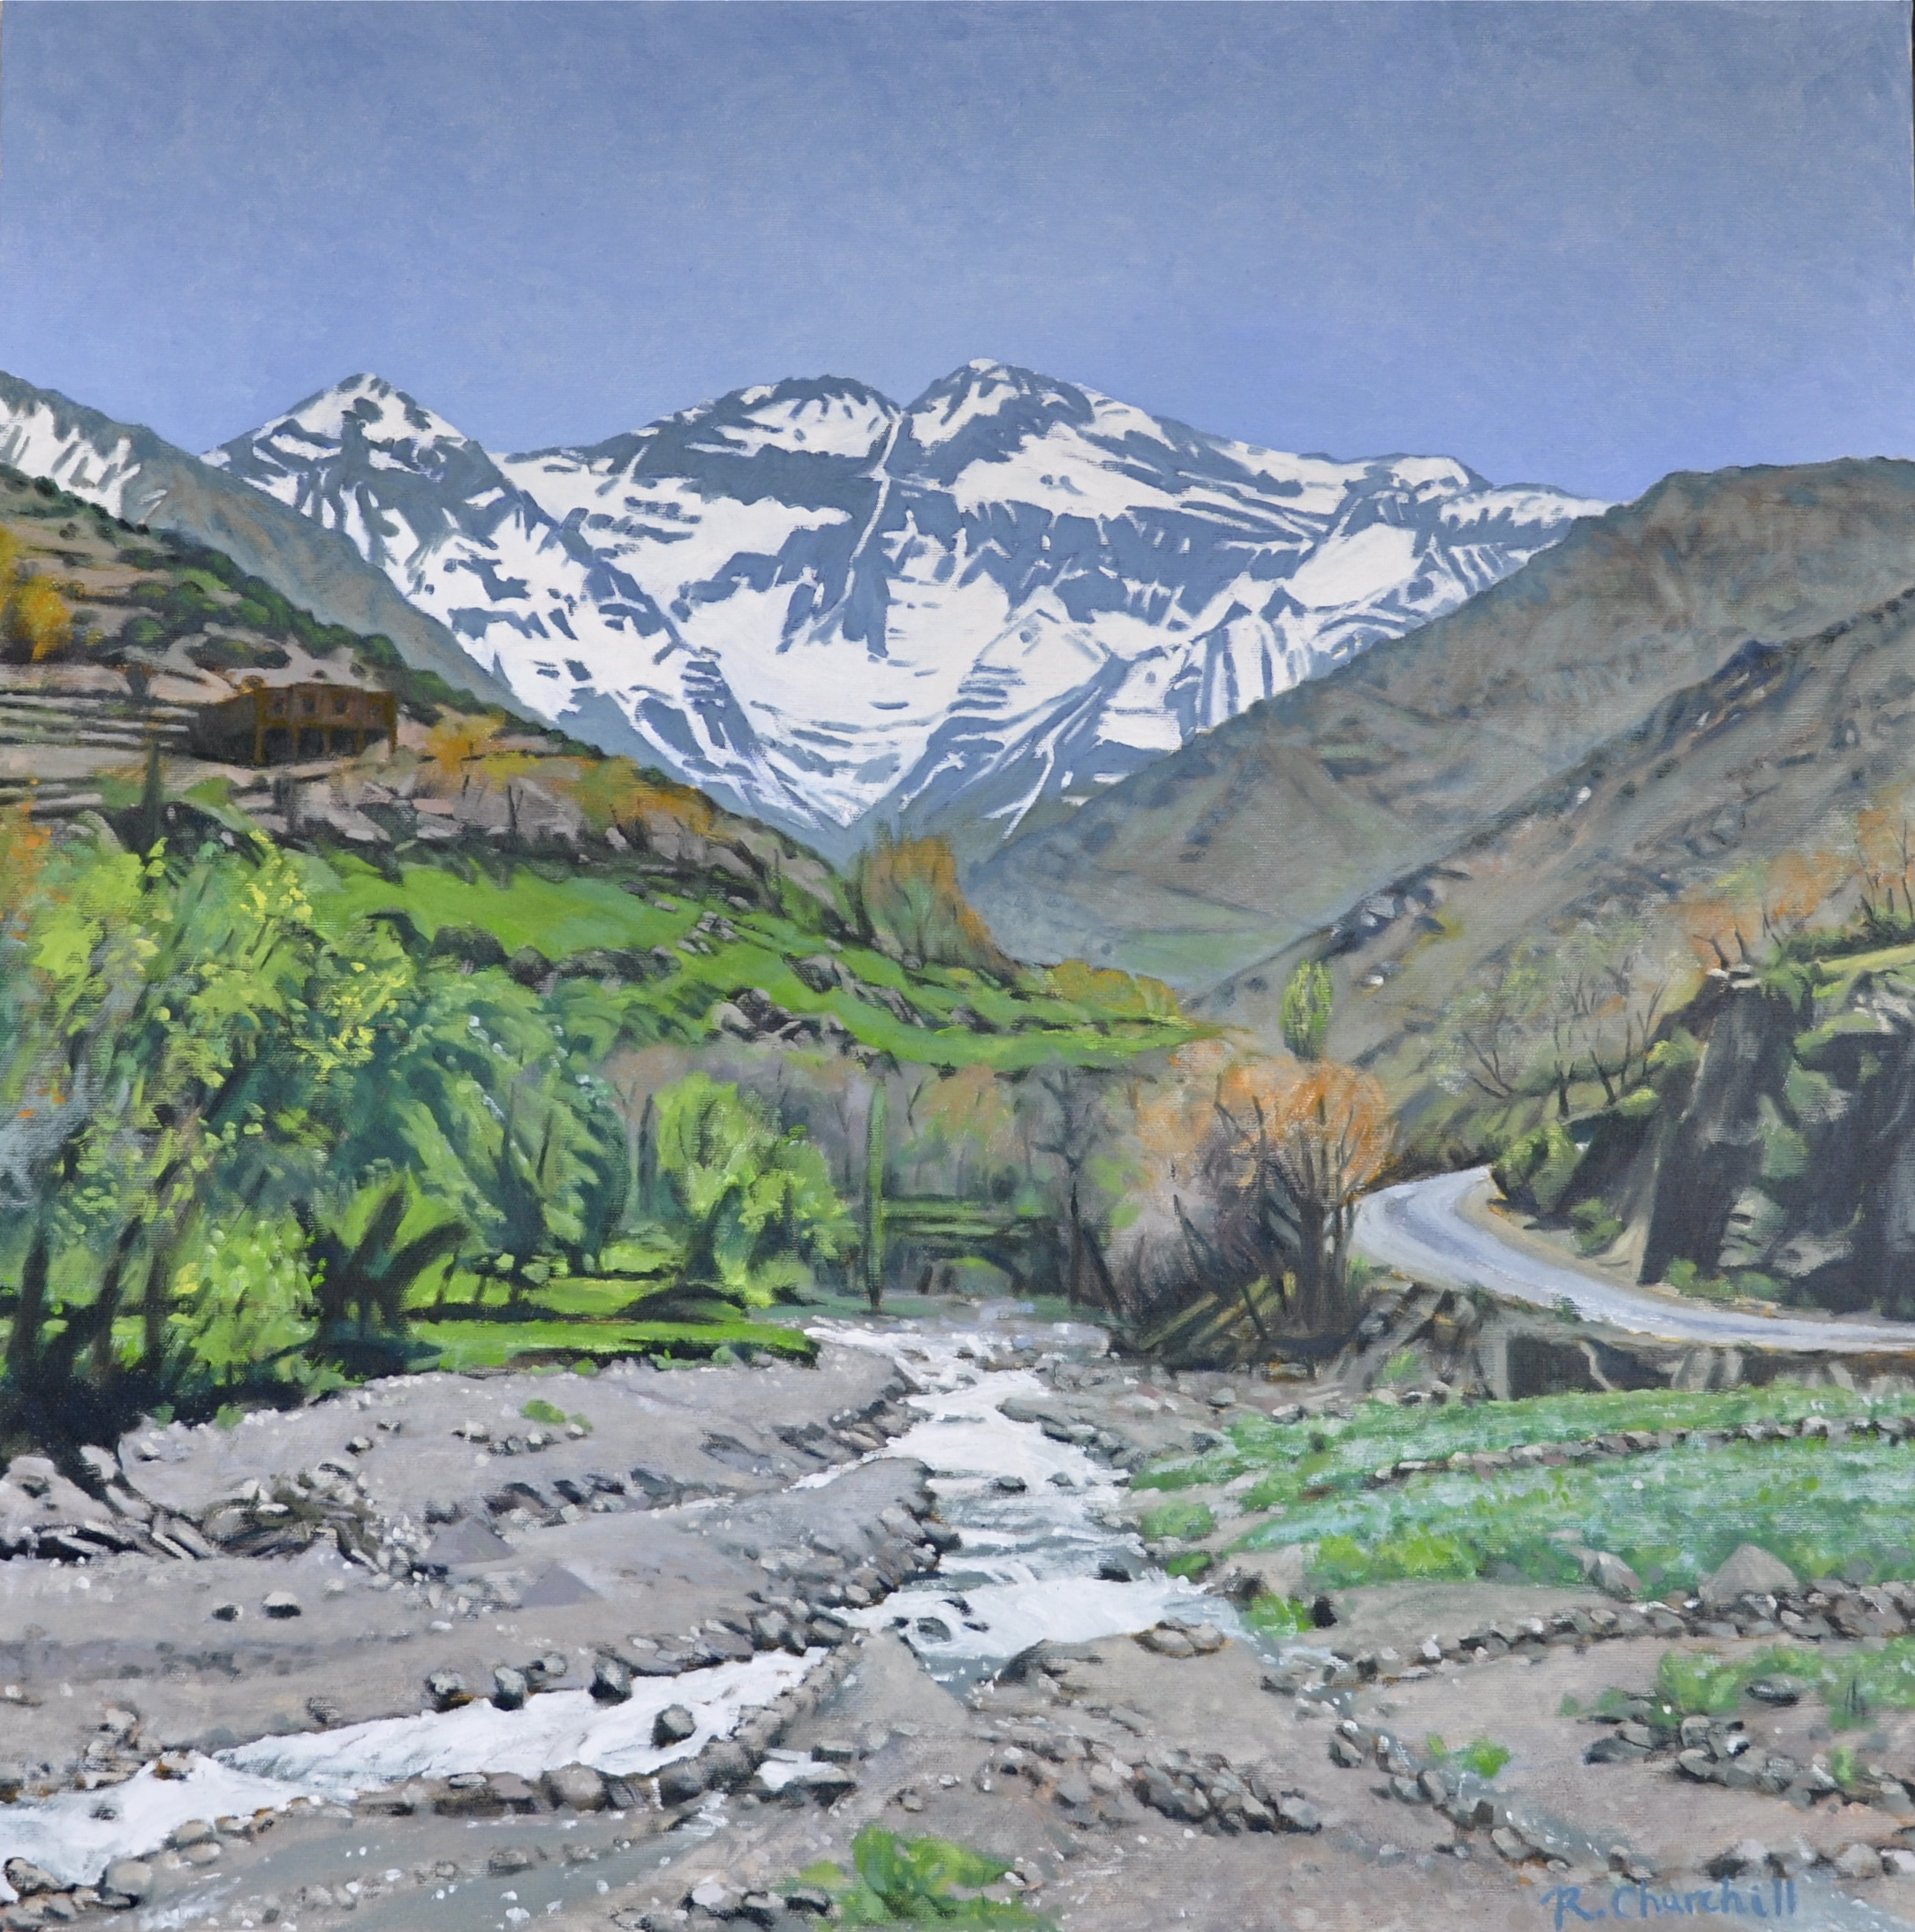 Mountain View; Road to Imlil